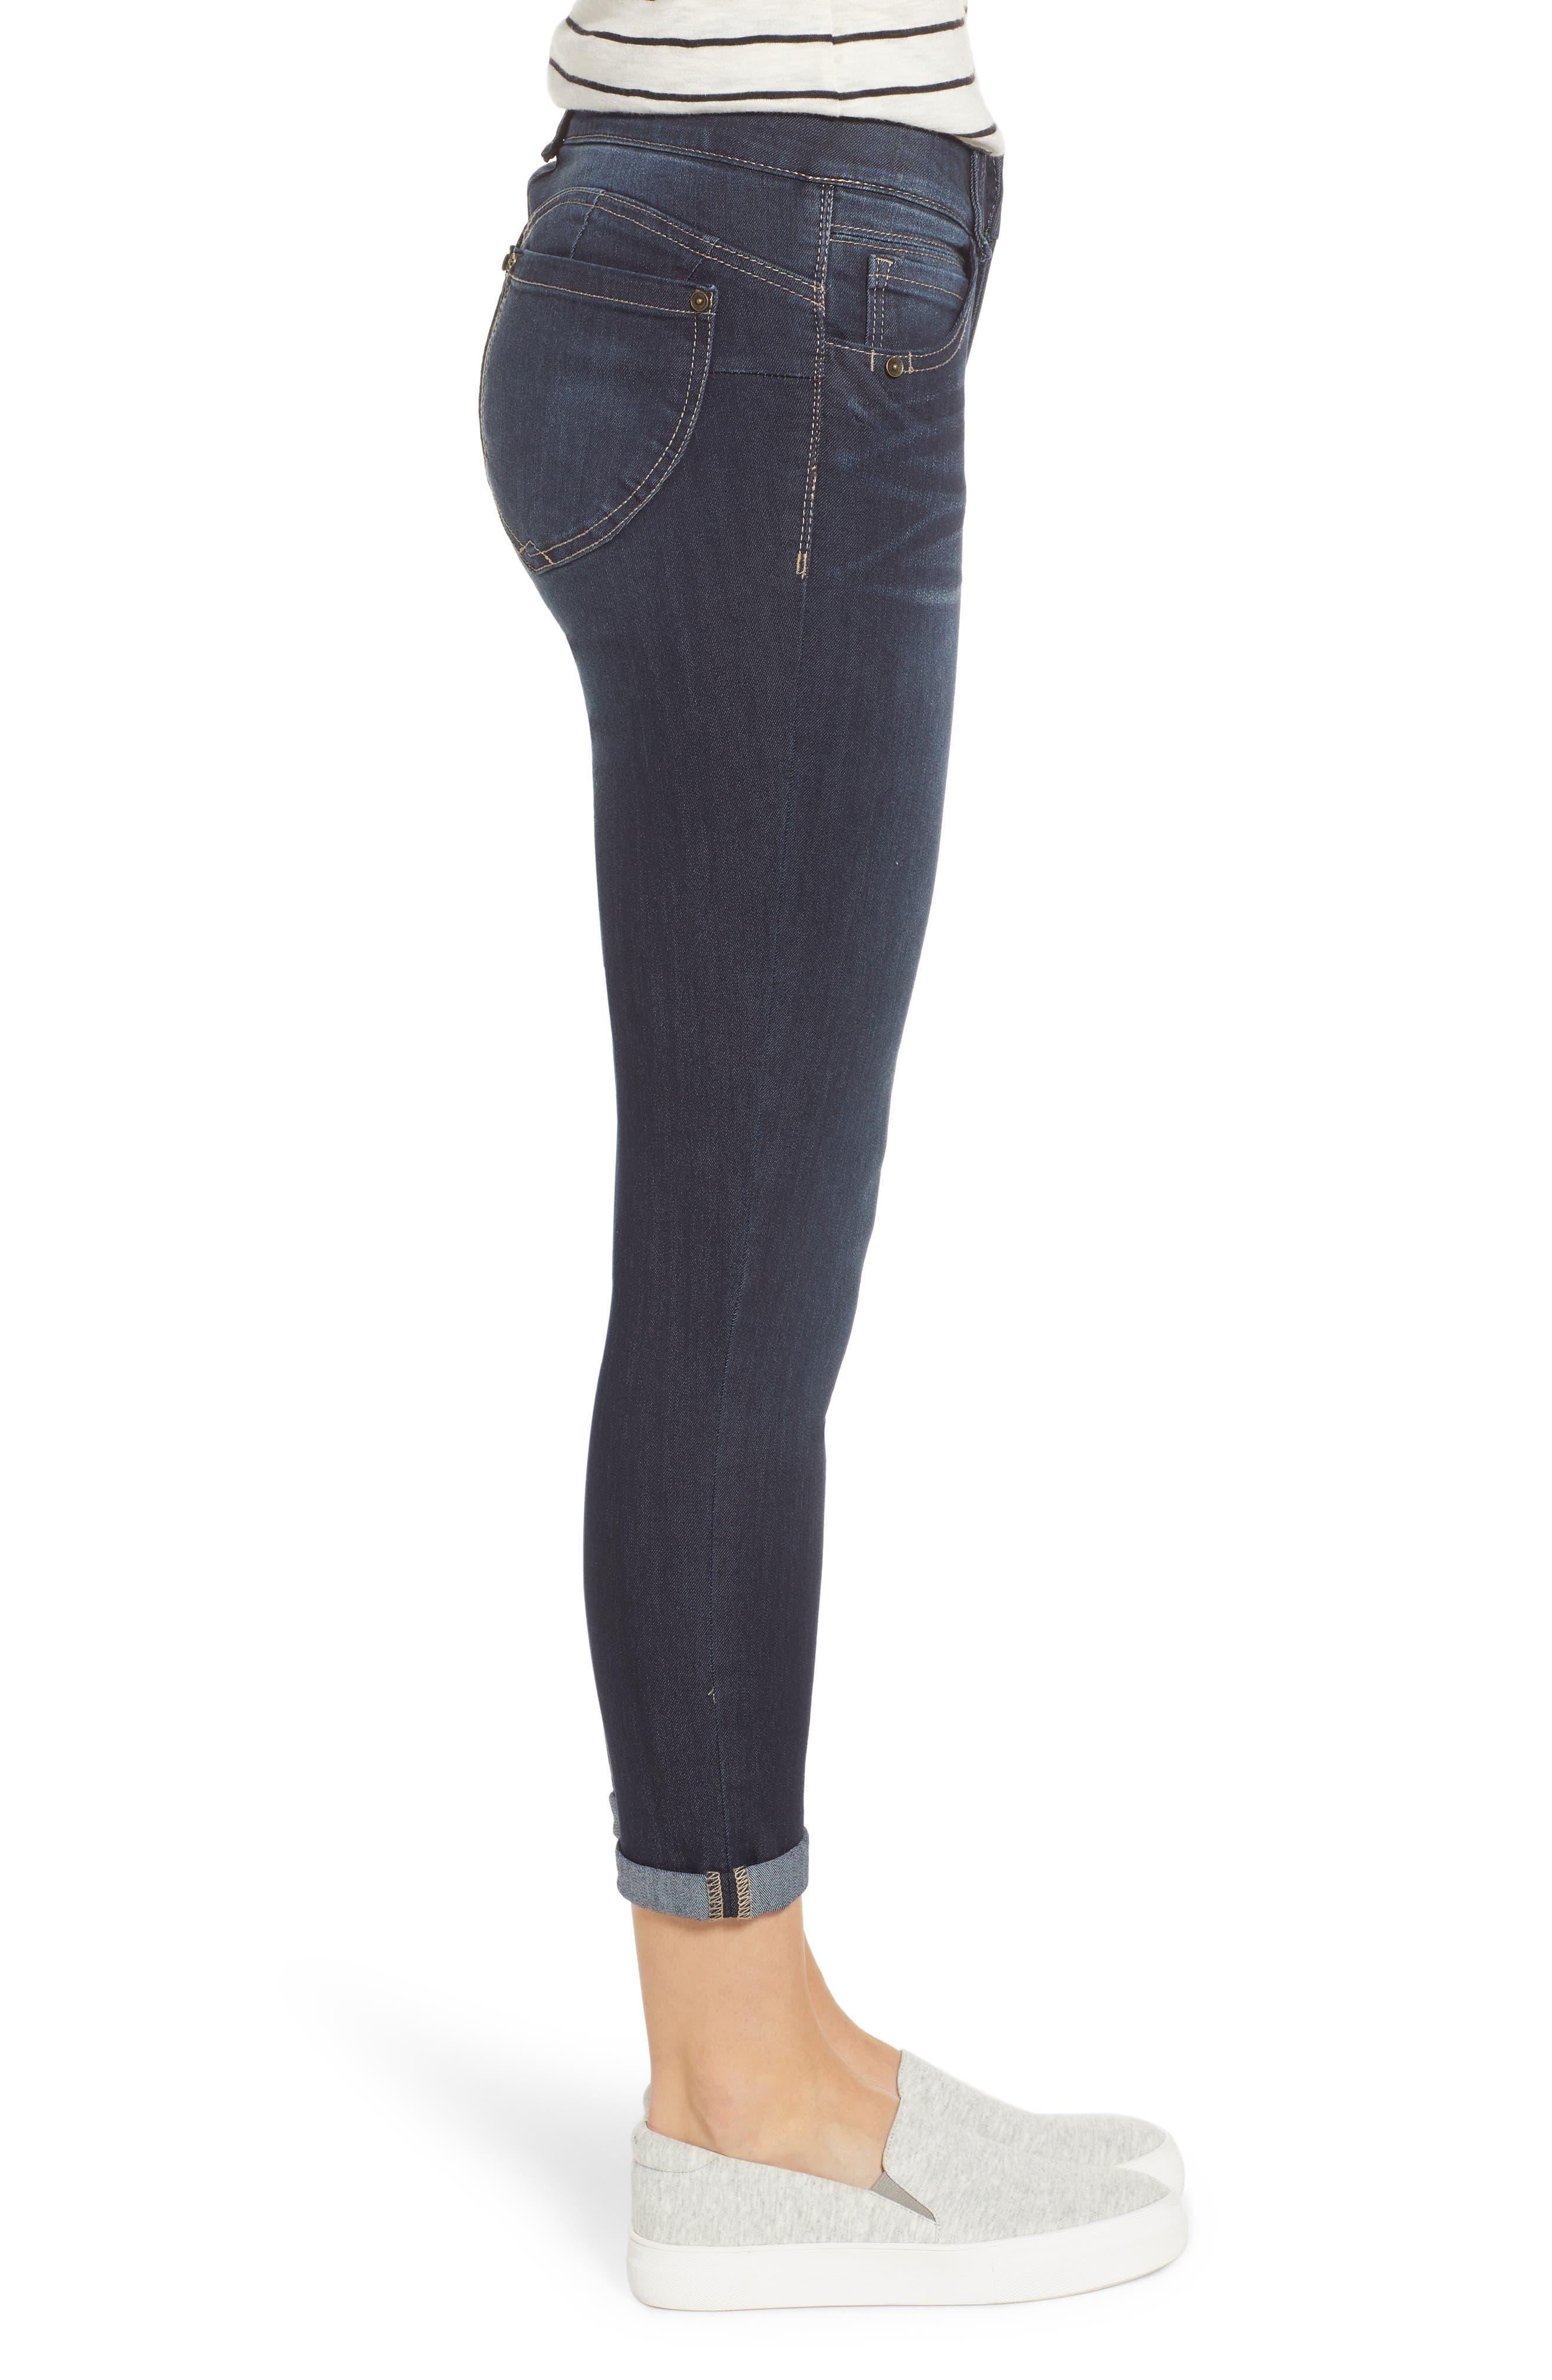 Ab-Solution Ankle Skimmer Jeans,                             Alternate thumbnail 3, color,                             INDIGO